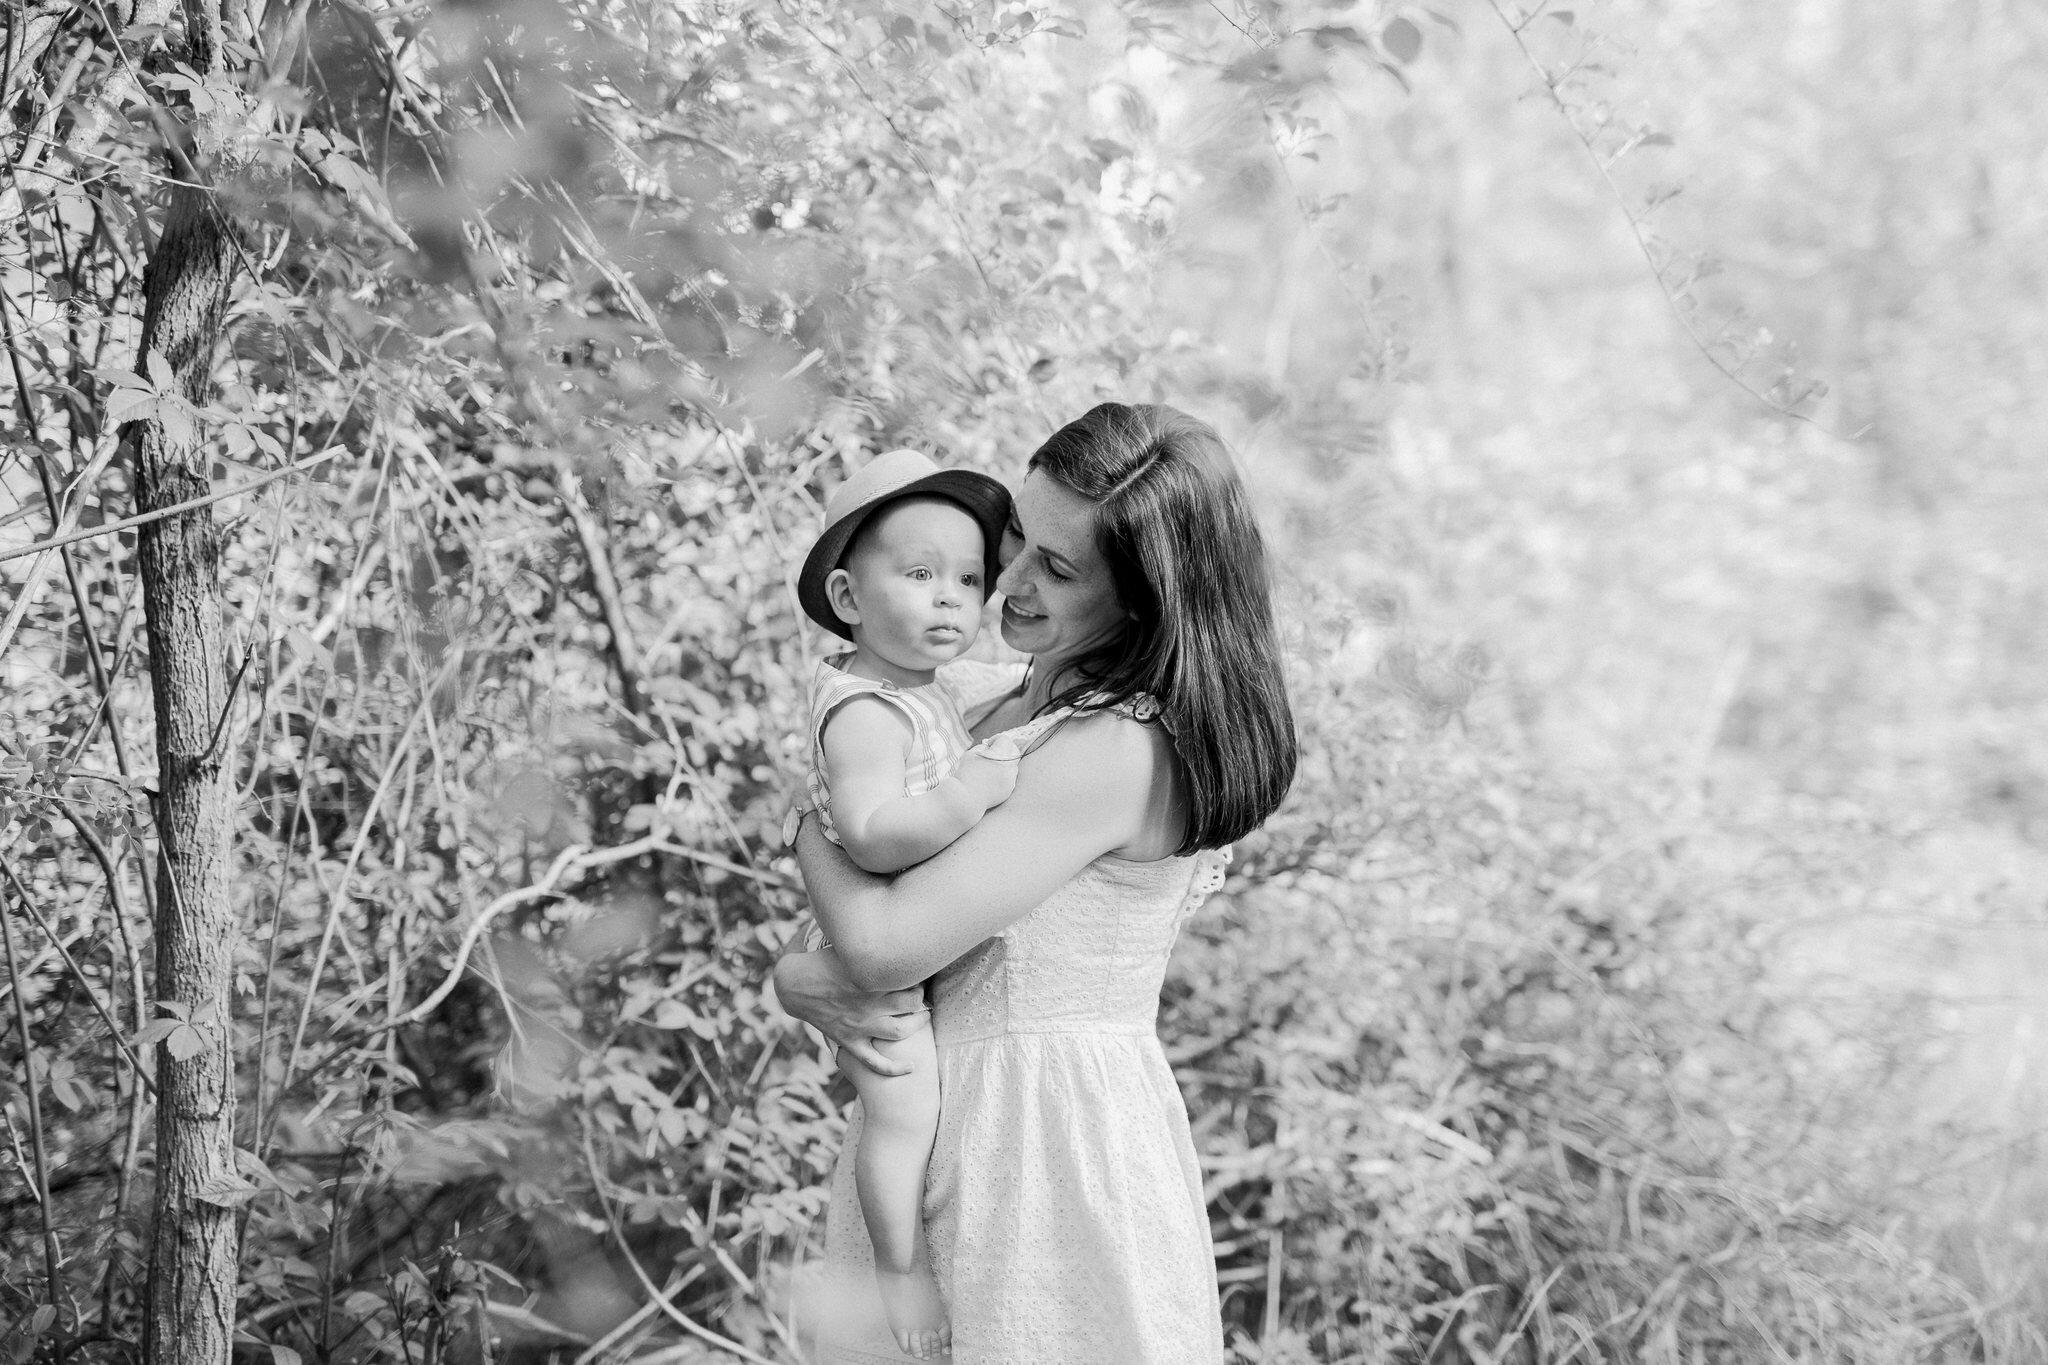 ct motherhood session_motherhood story CT_motherhood photographcer CT_8.jpg